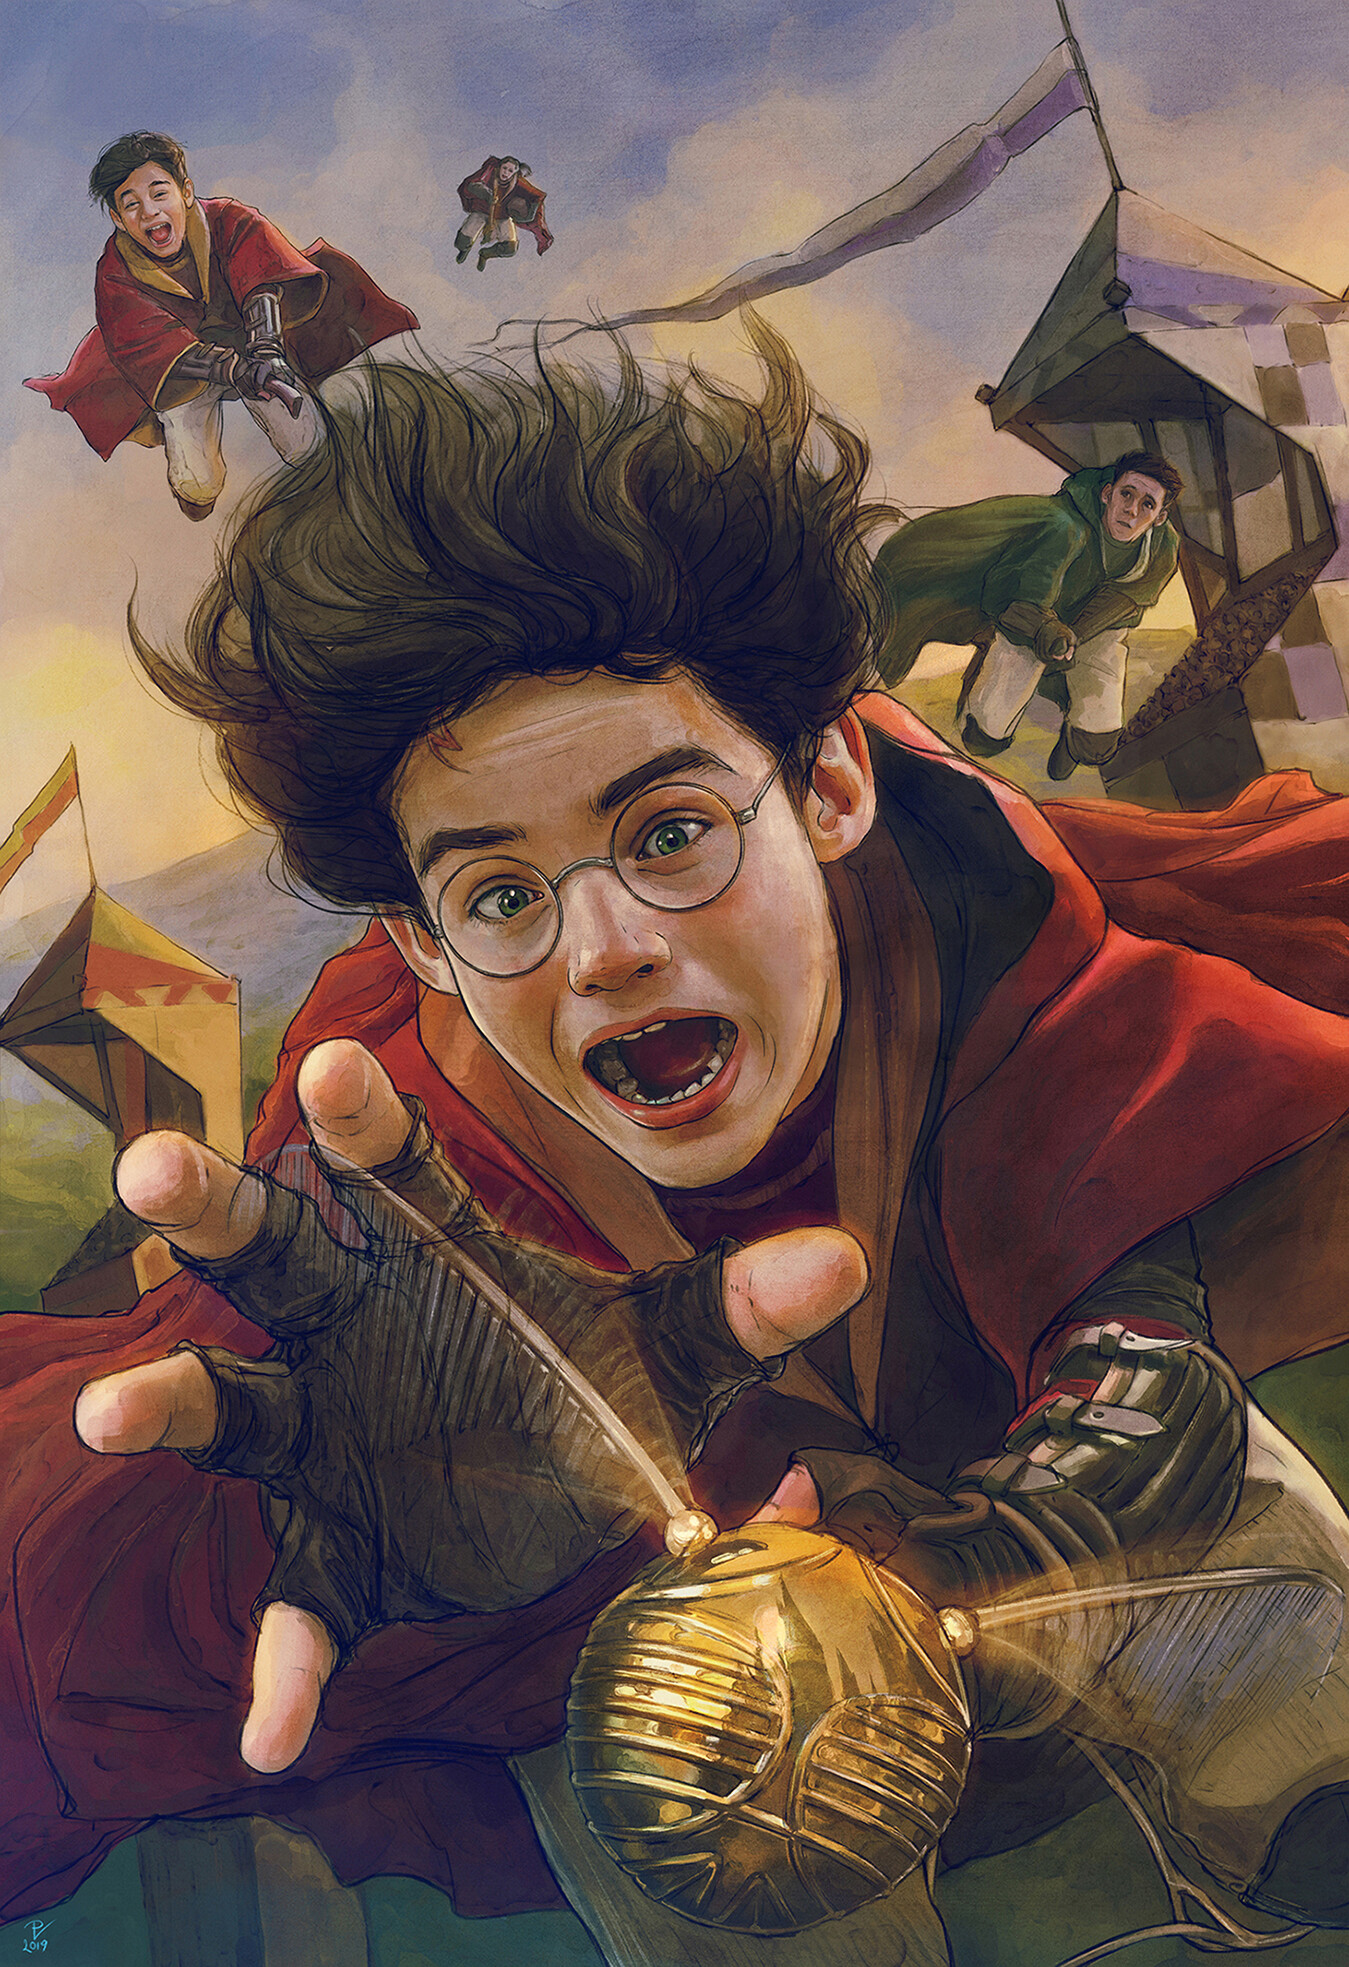 Artstation Harry Potter And The Philosopher S Stone Fanart 16 Vladislav Pantic